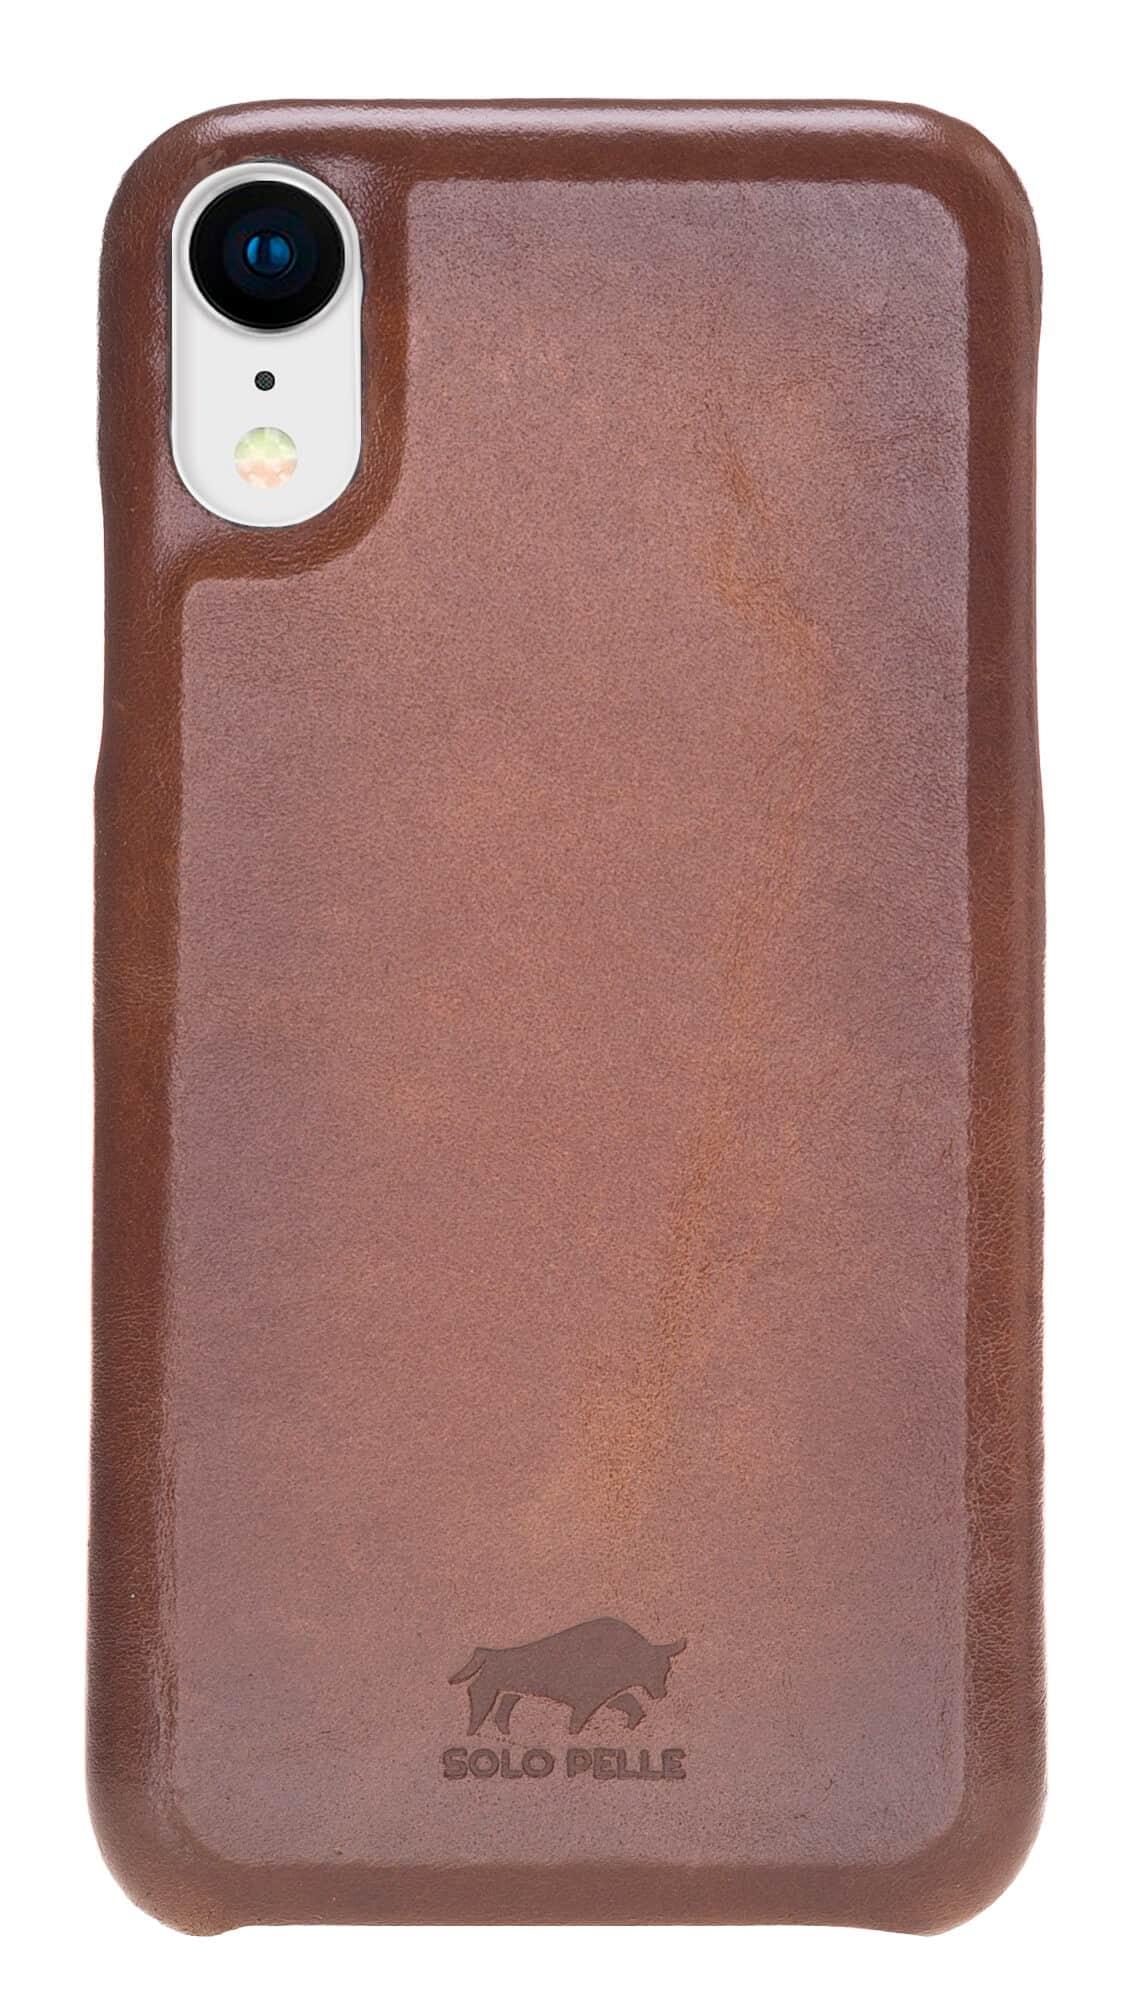 "iPhone XR 6.1 Zoll Abnehmbare Lederhülle ""Clemson"" in Cognac Braun Burned"